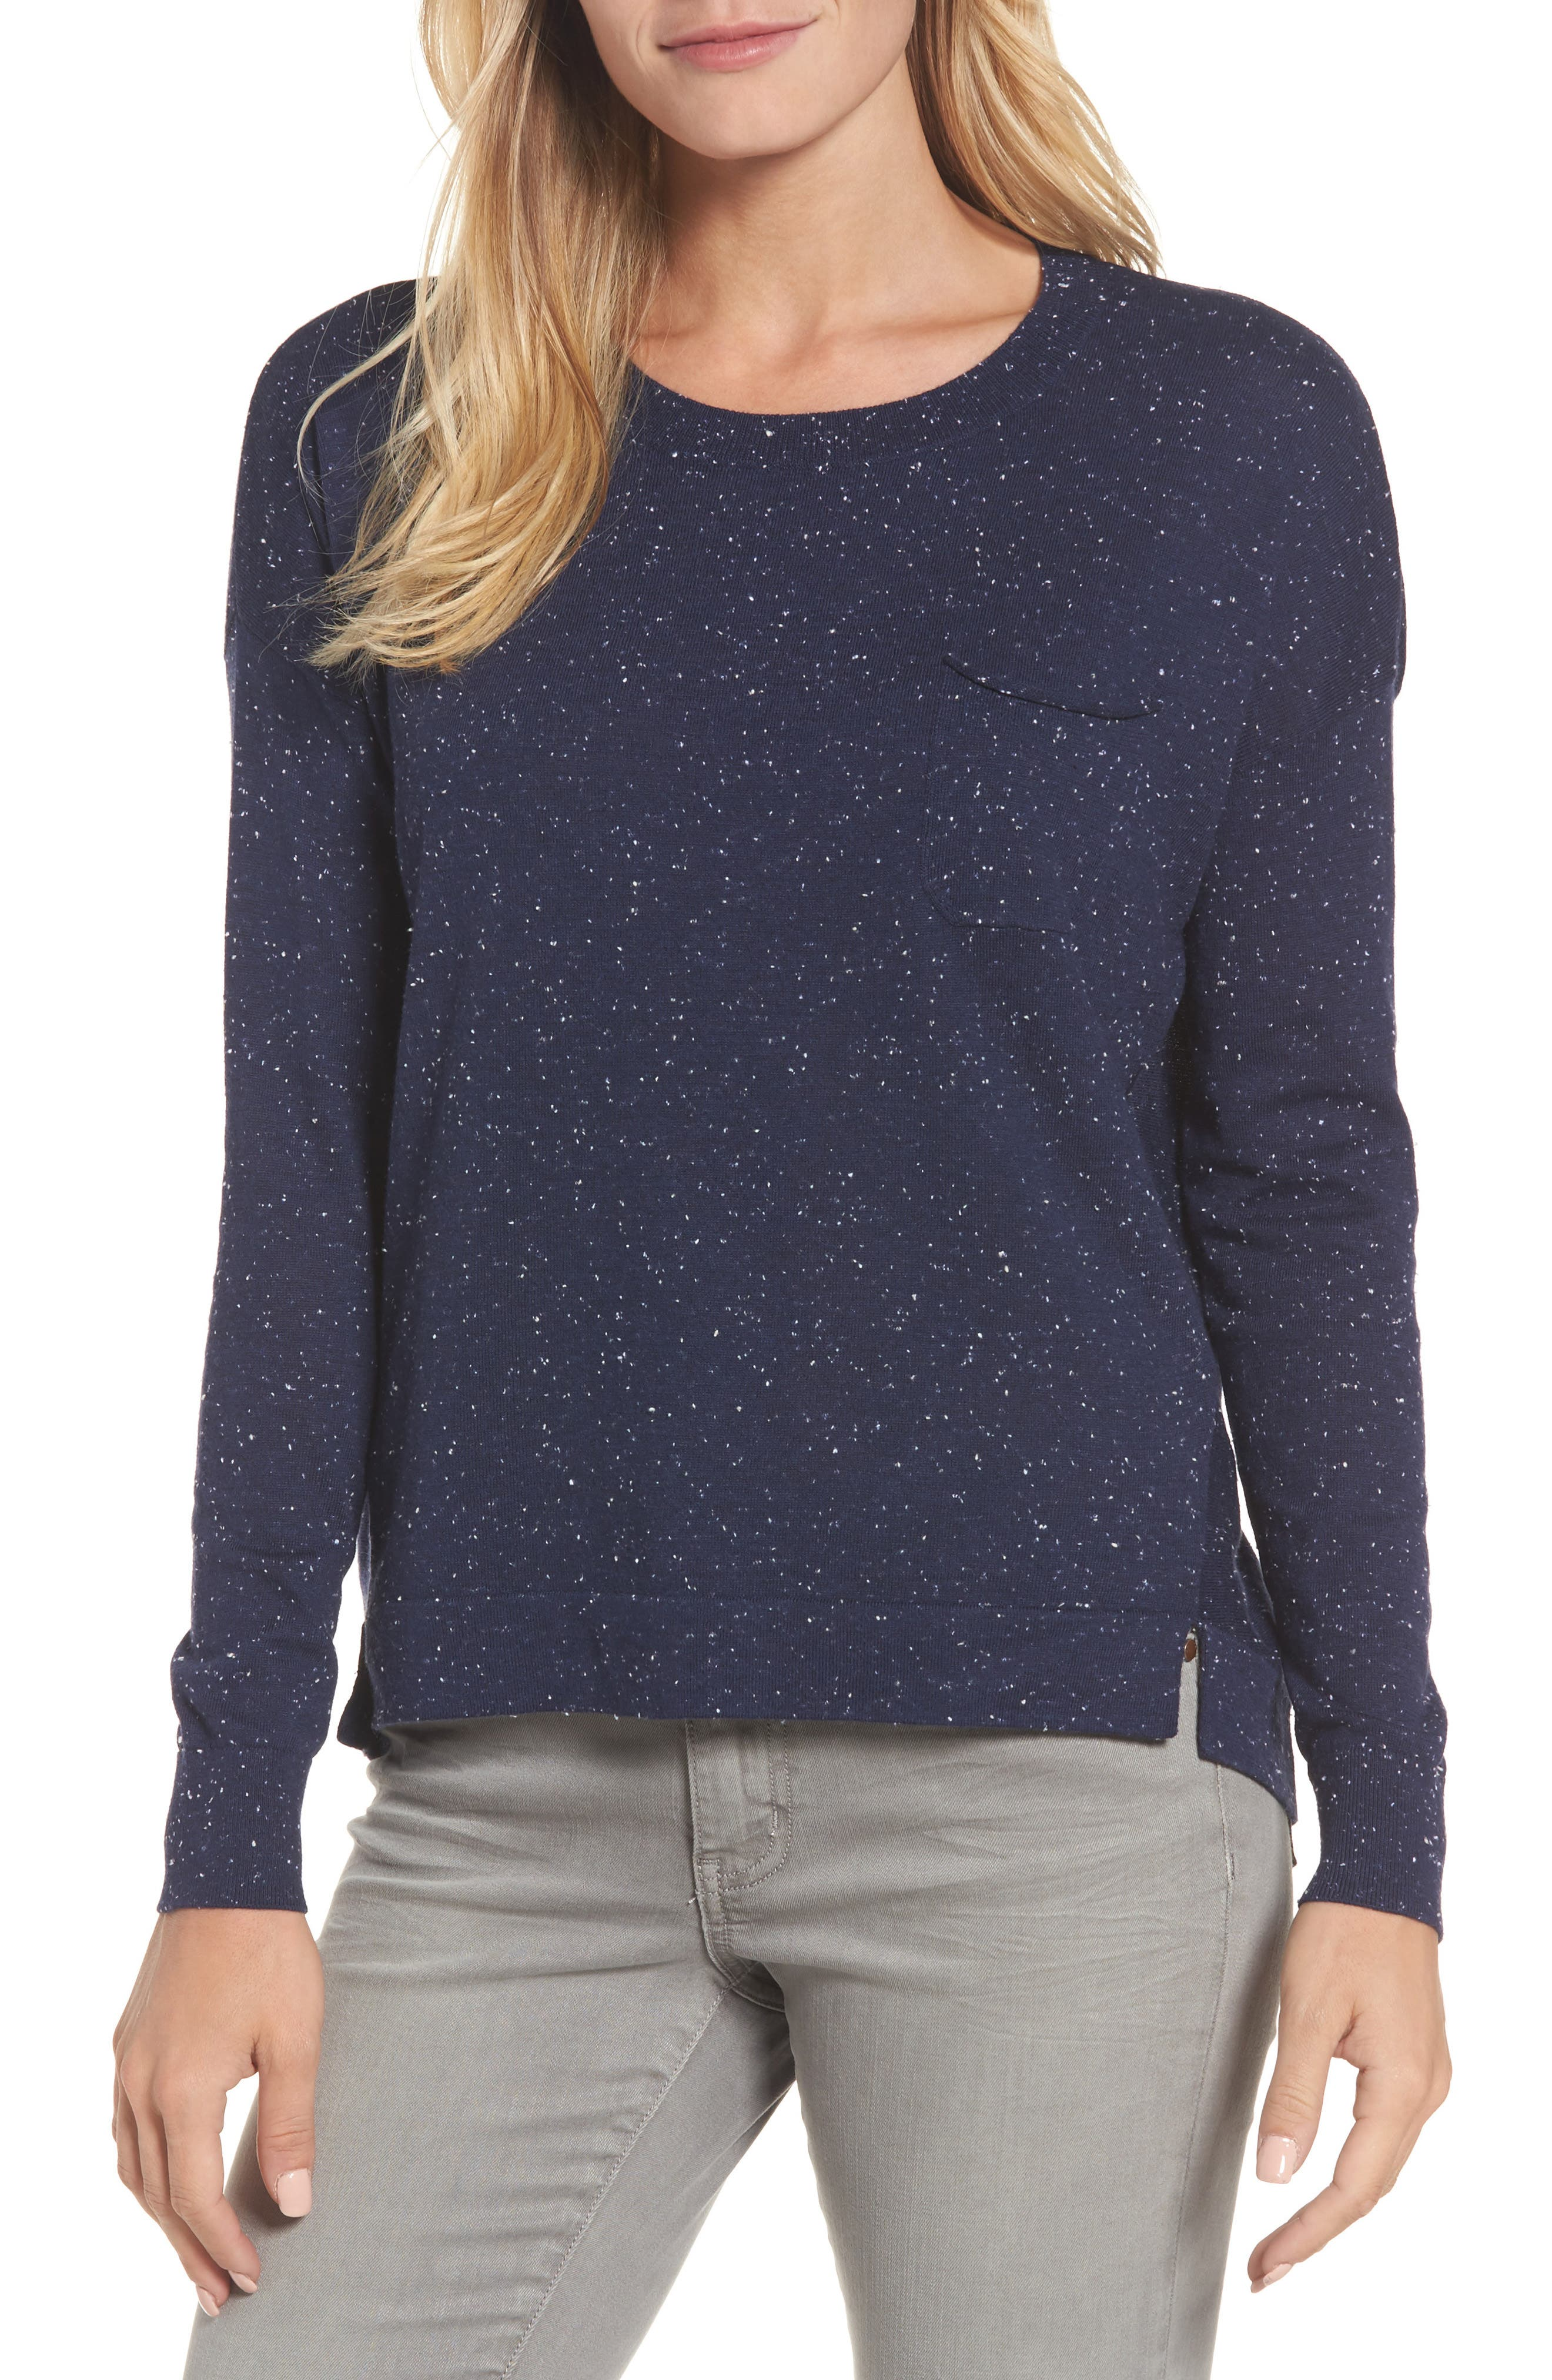 Alternate Image 1 Selected - Caslon® Pleat Back High/Low Crewneck Sweater (Regular & Petite)